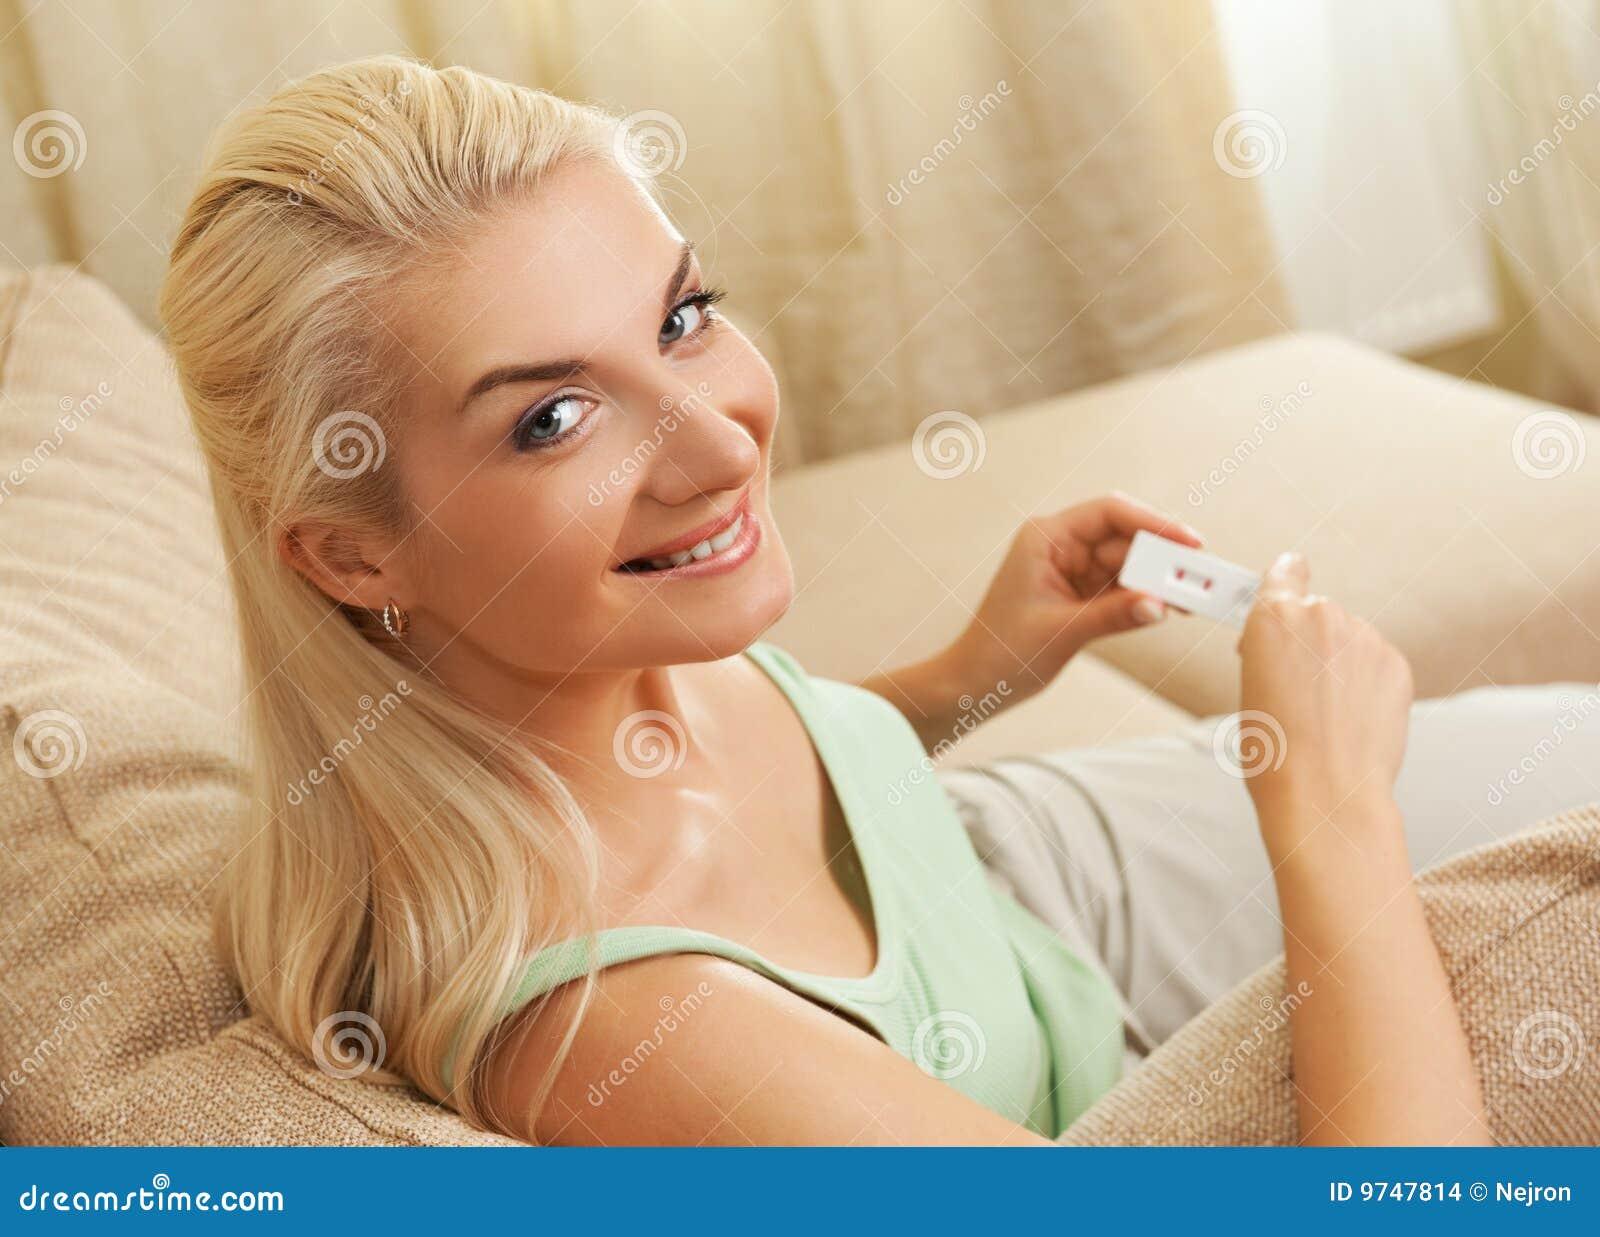 Woman holding positive pregnancy test